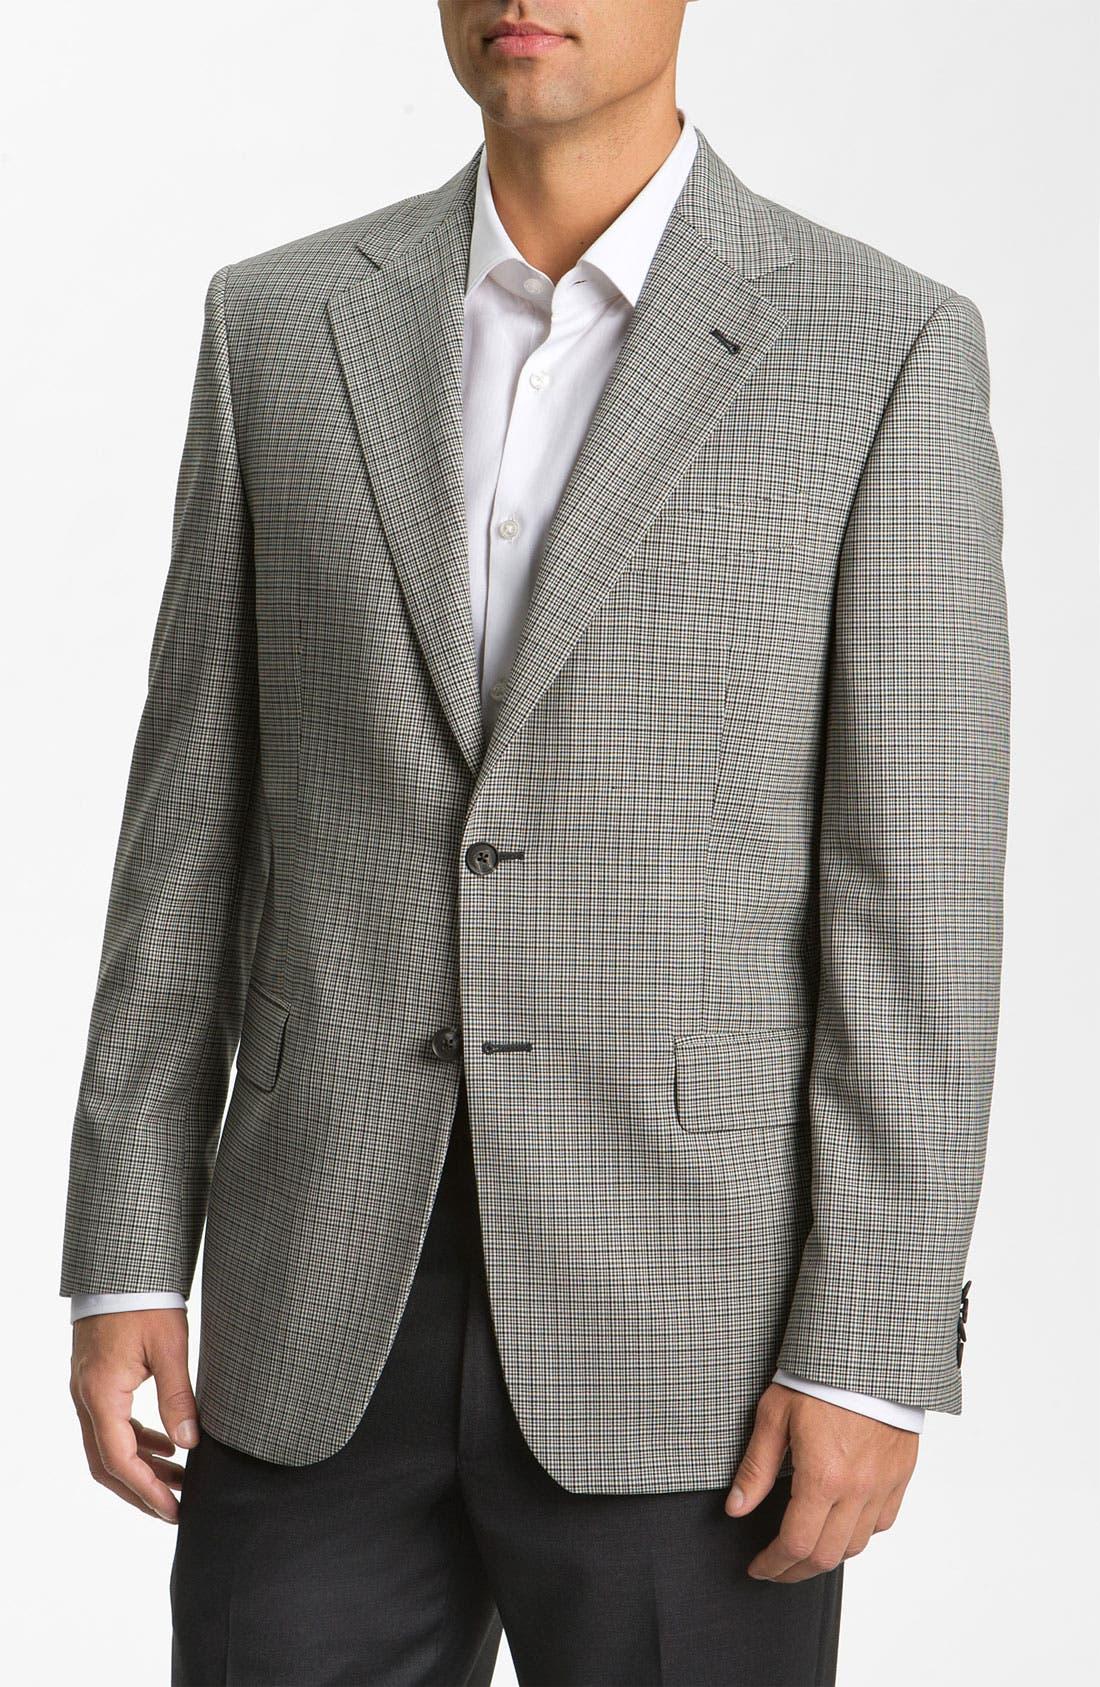 Main Image - Joseph Abboud 'Signature Silver' Check Sportcoat